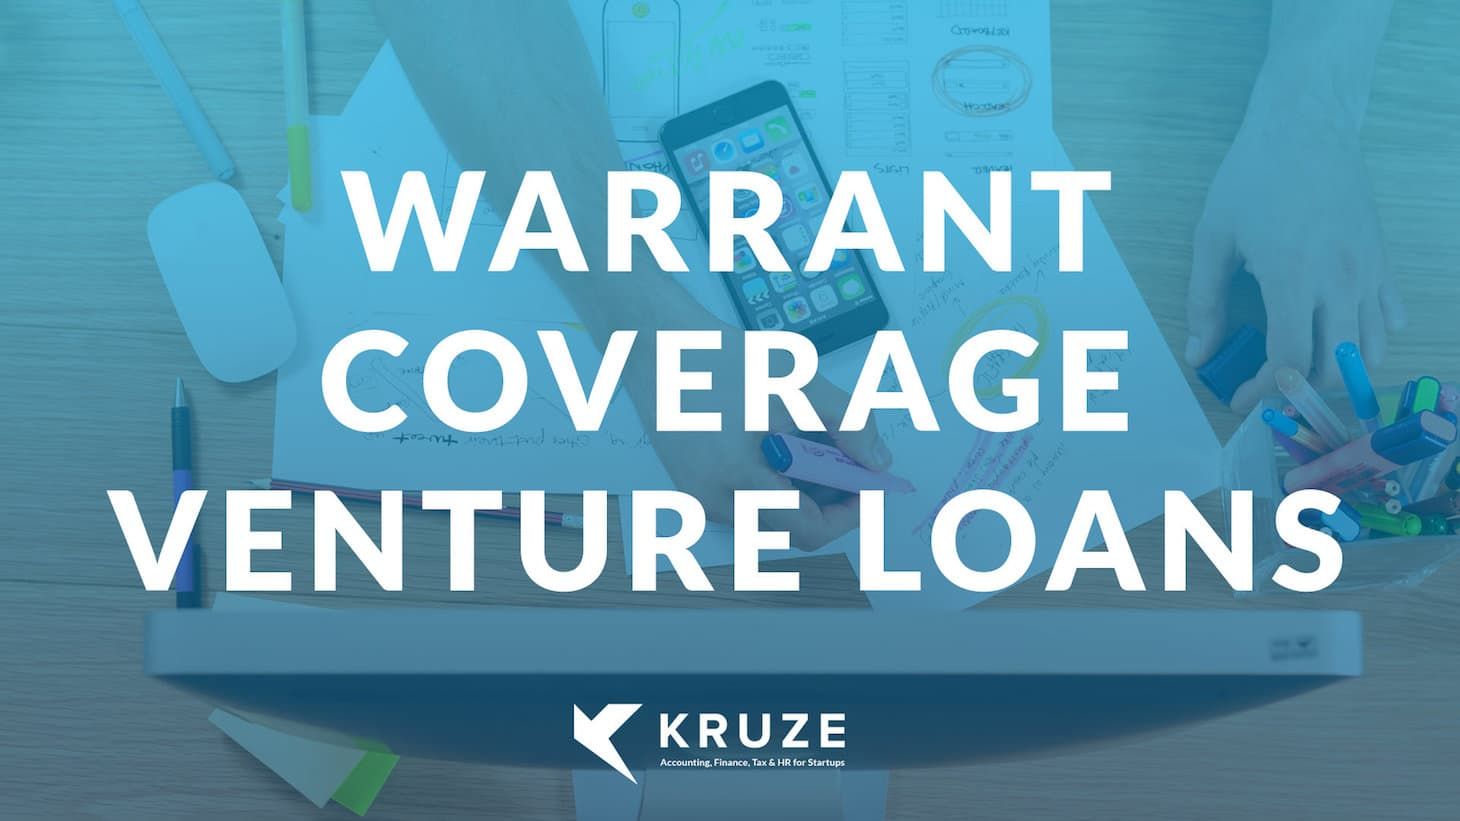 Warrant Coverage Venture Loans